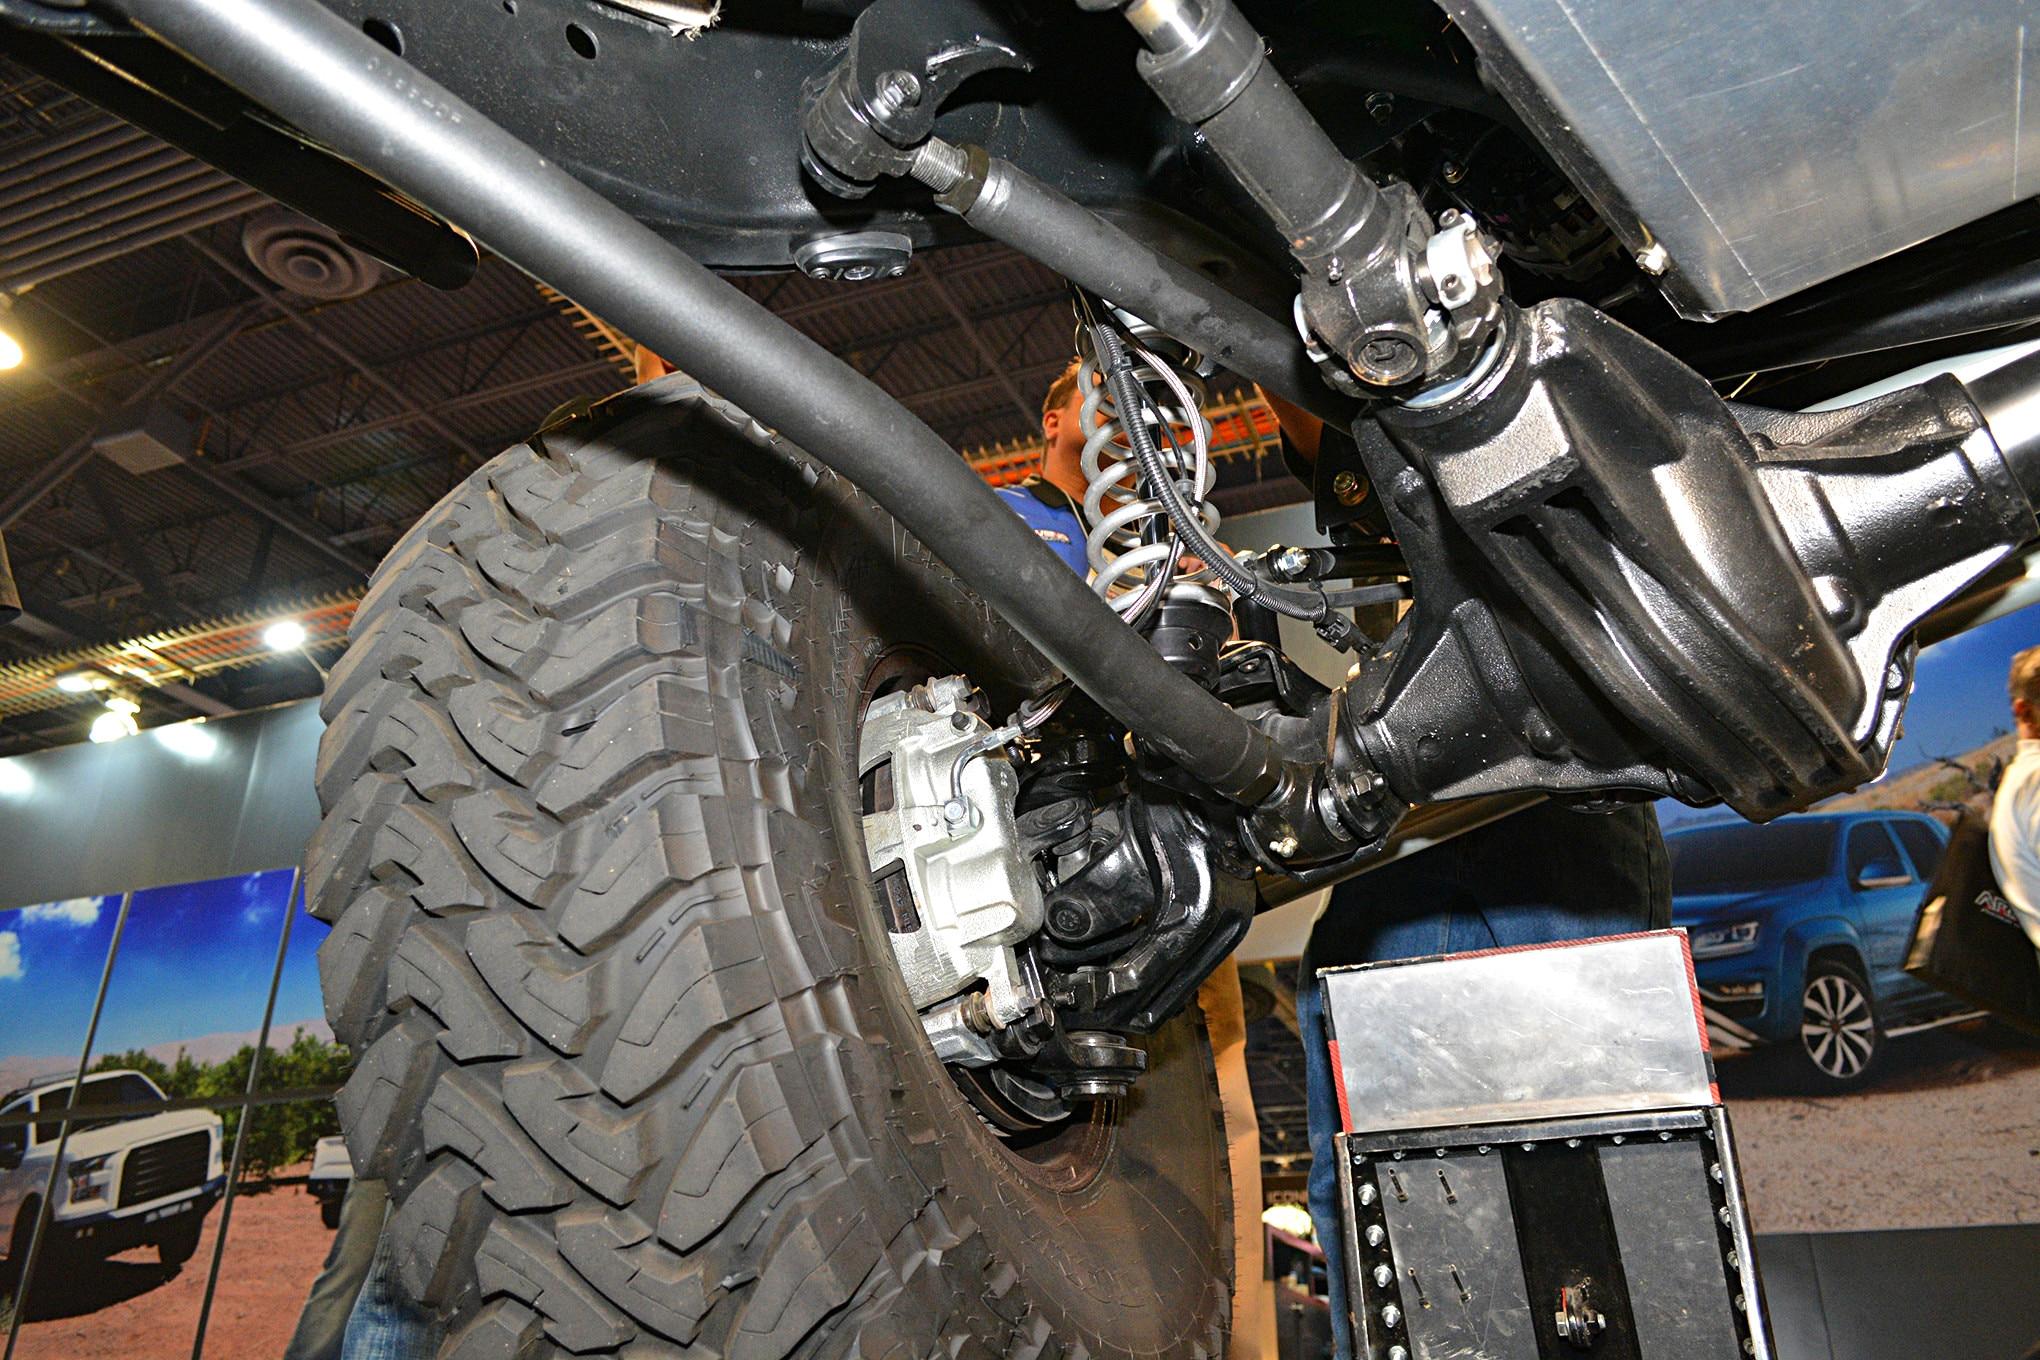 003 sema jeep mini feature 6x6 front axle.JPG